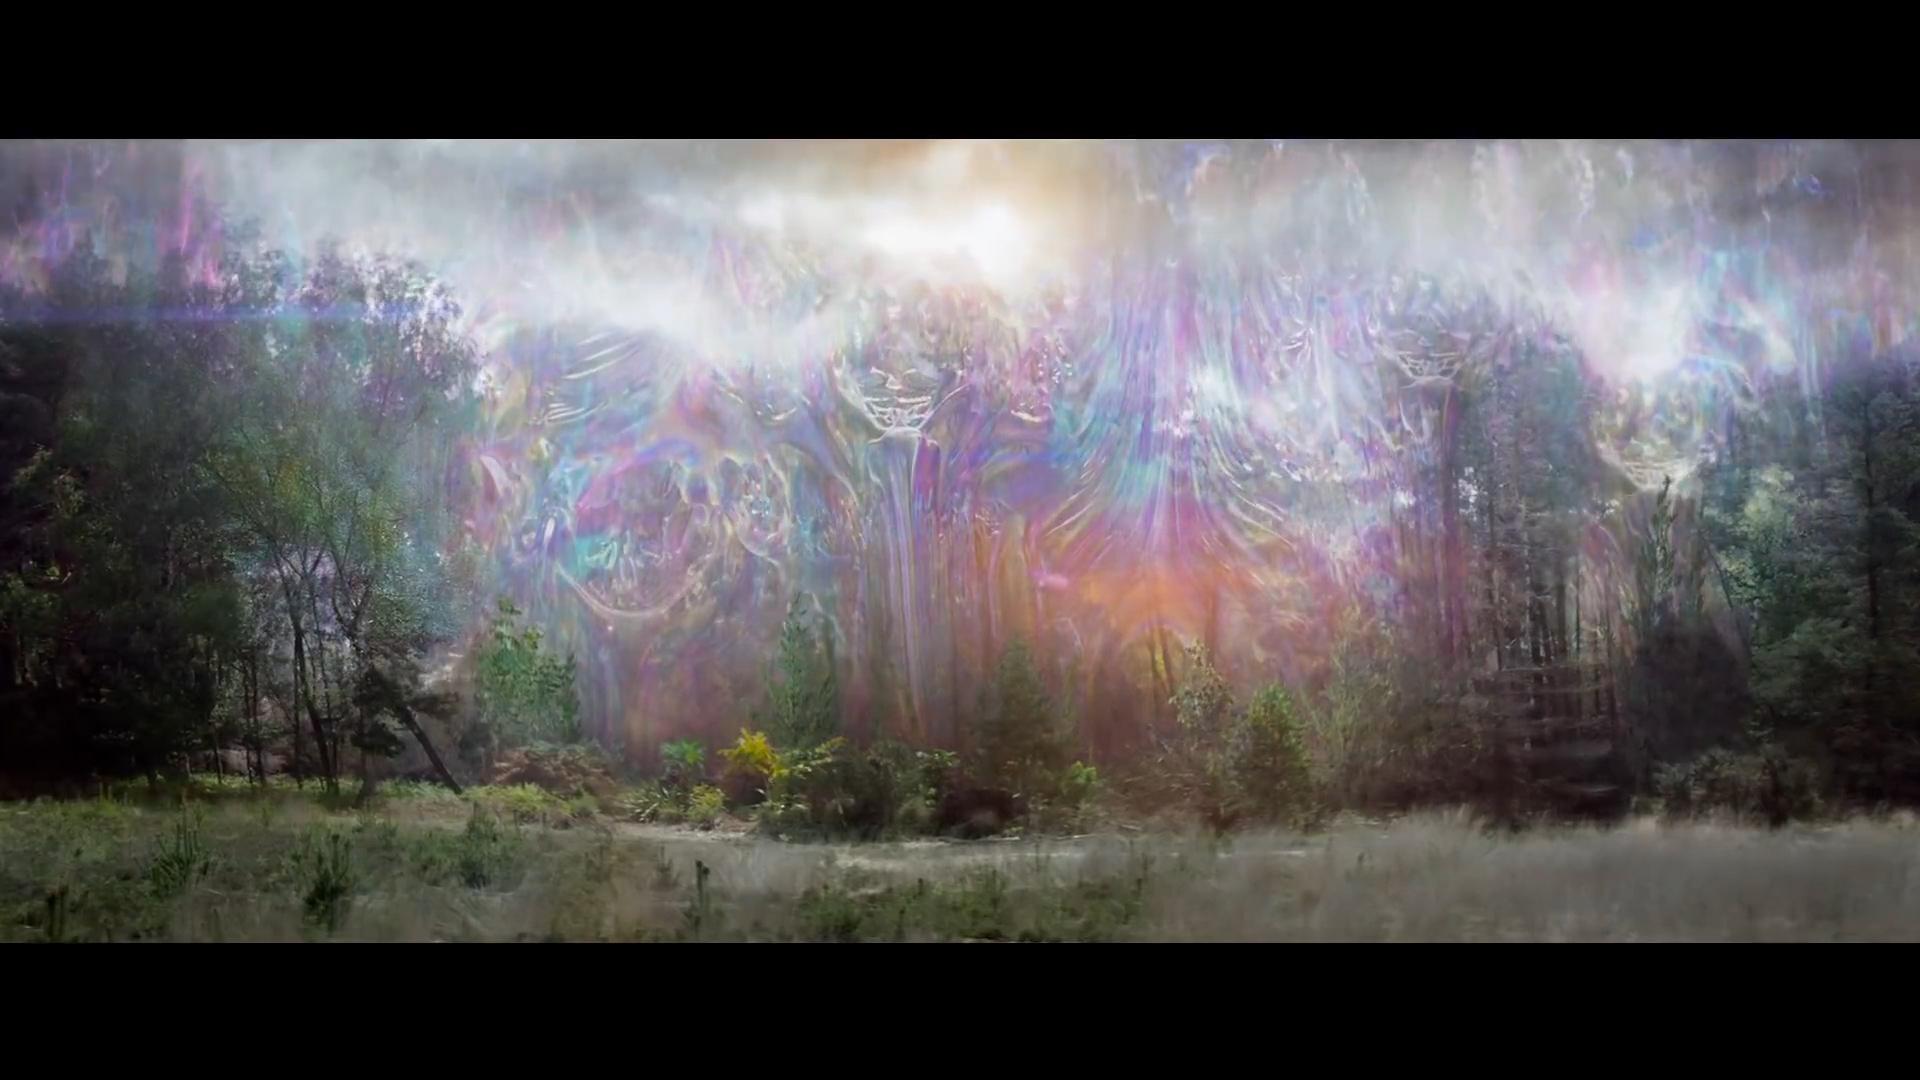 [1] Annihilation - Official Trailer